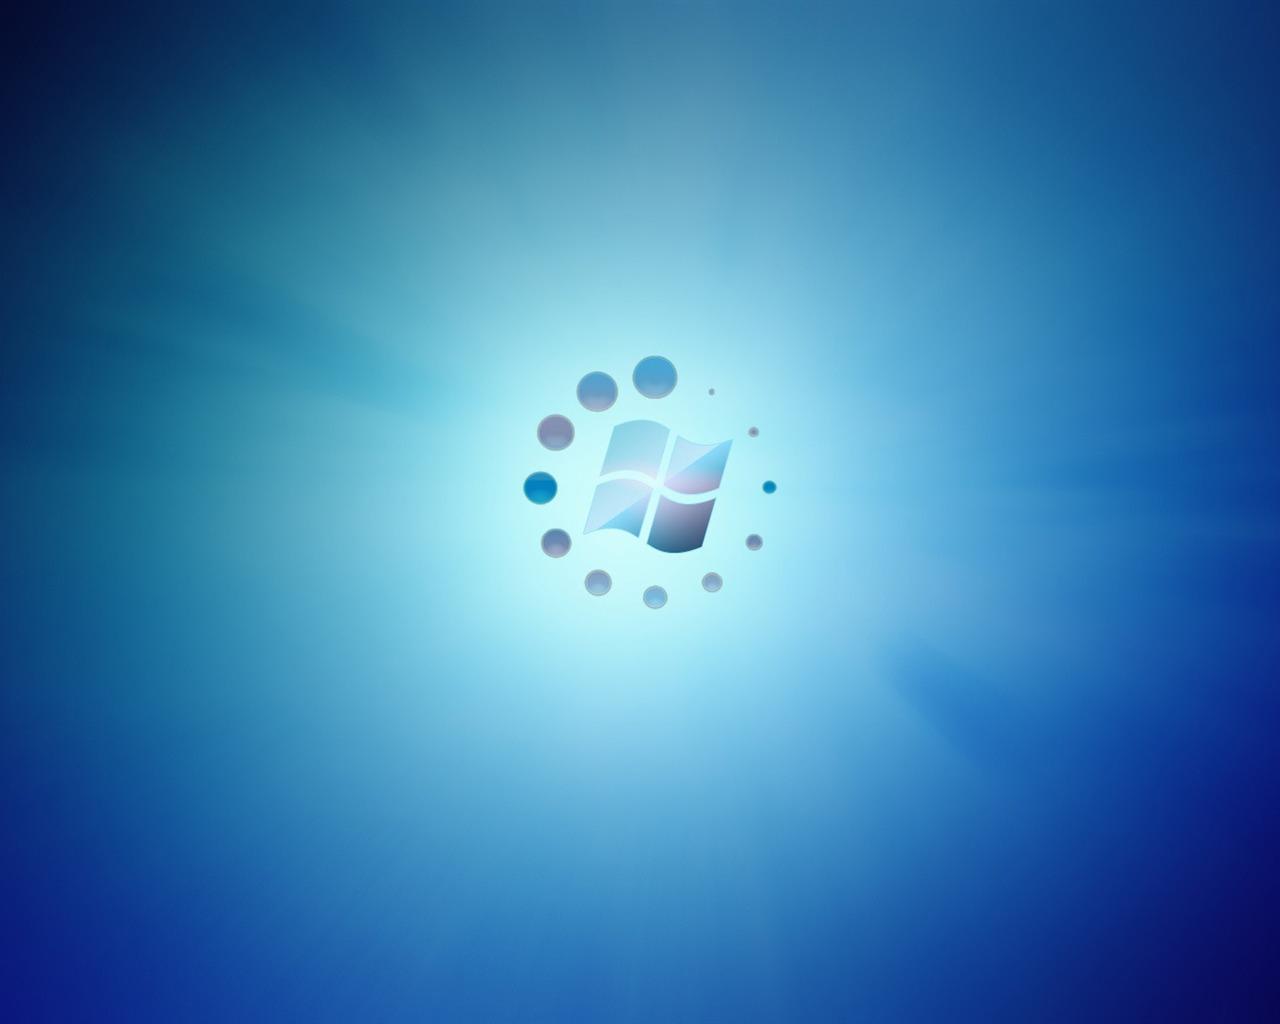 Windows 8 operating system desktop wallpaper 09   1280x1024 wallpaper 1280x1024